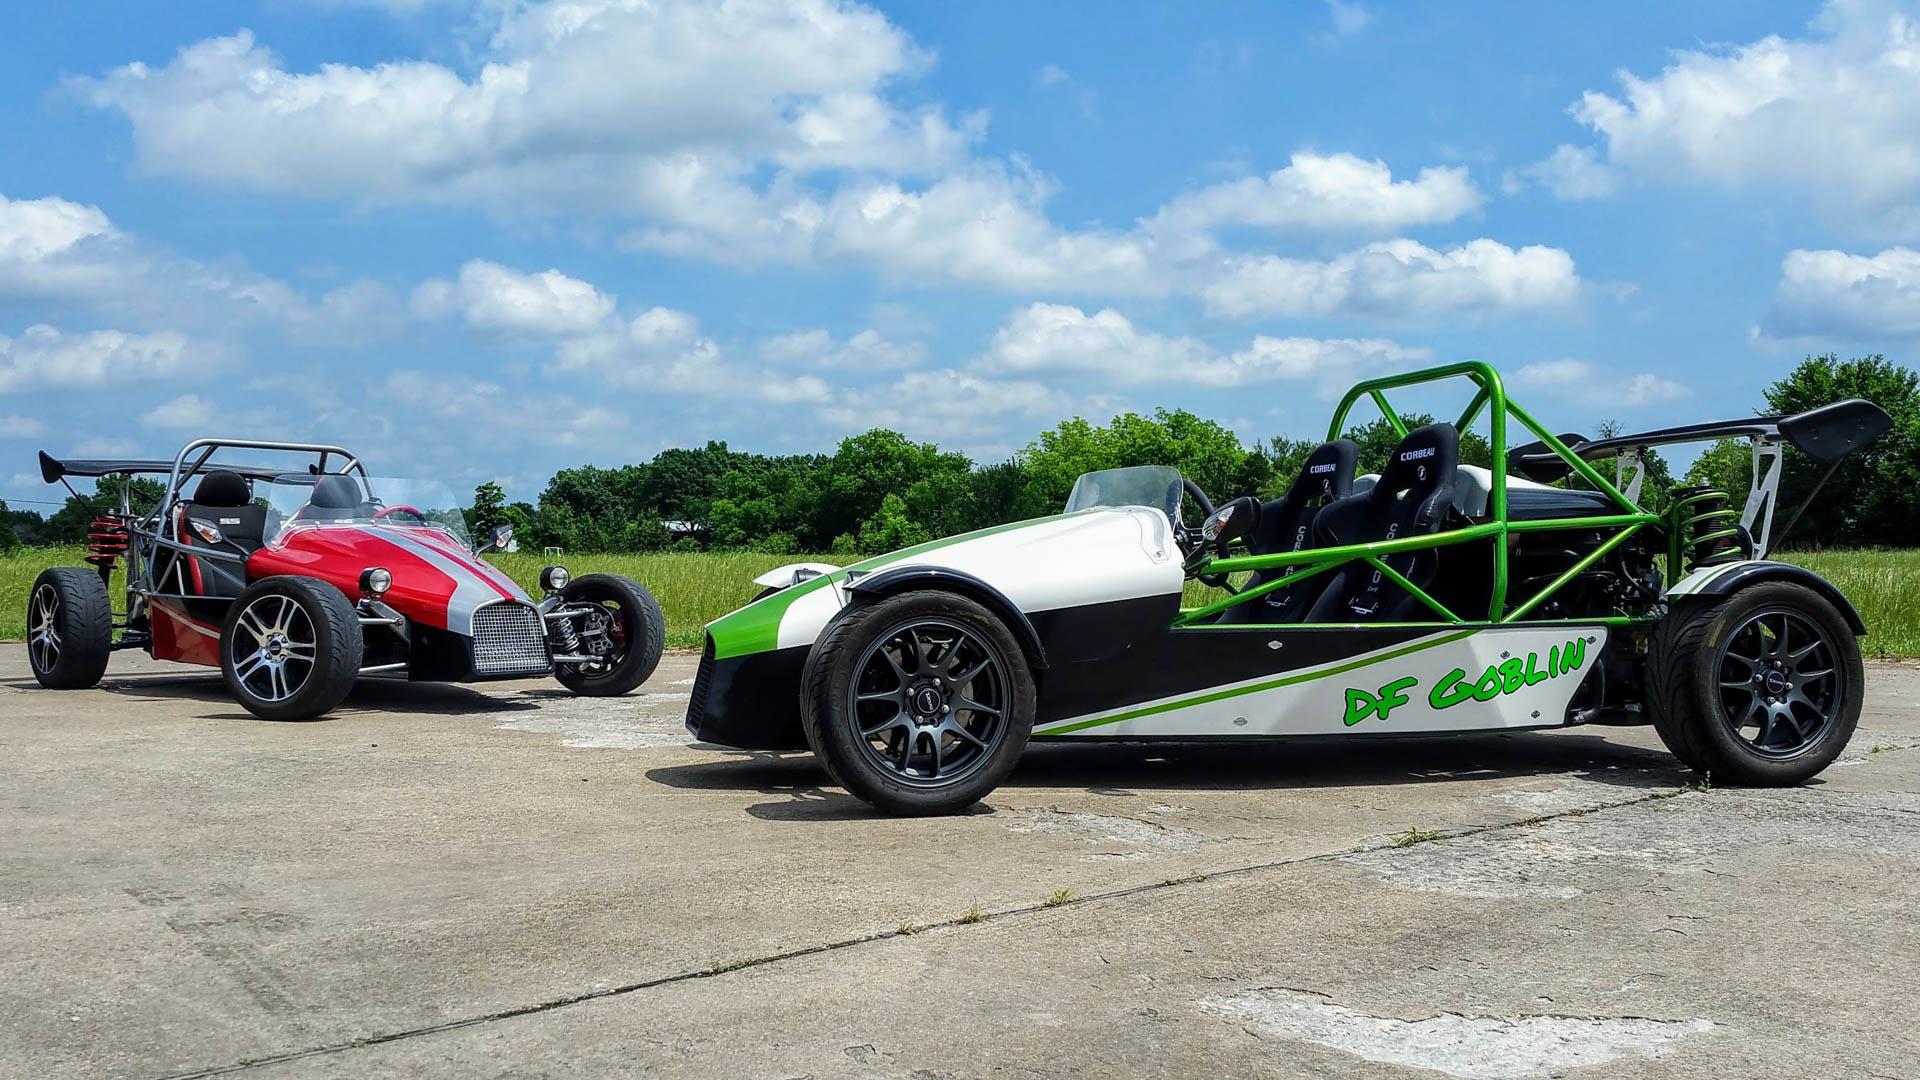 kit cars - DF Goblin